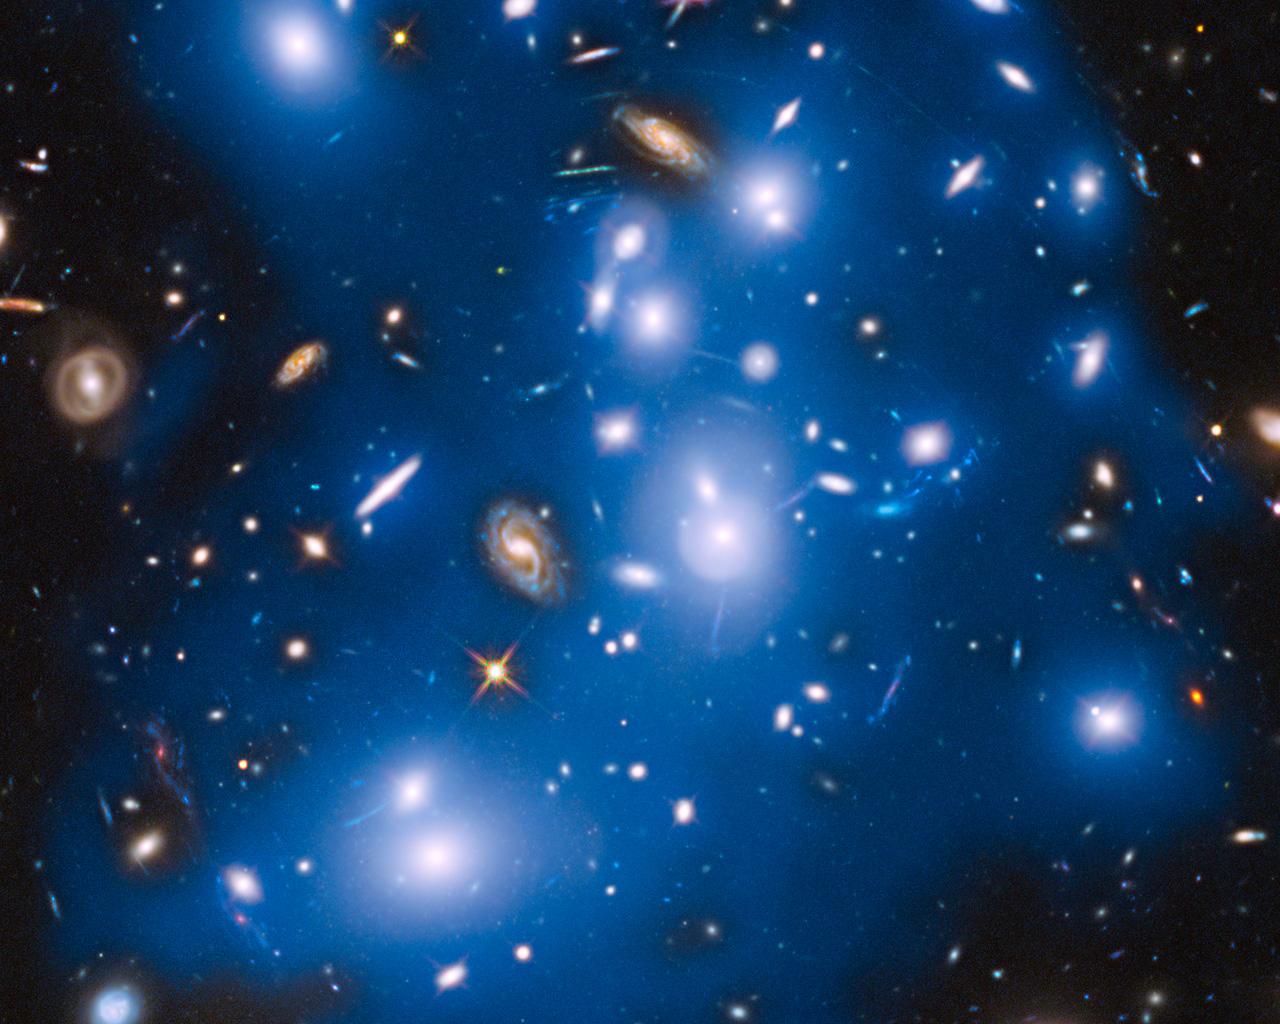 Hubble Telescope Wallpaper Mystic Mountain (page 2) - Pics ...